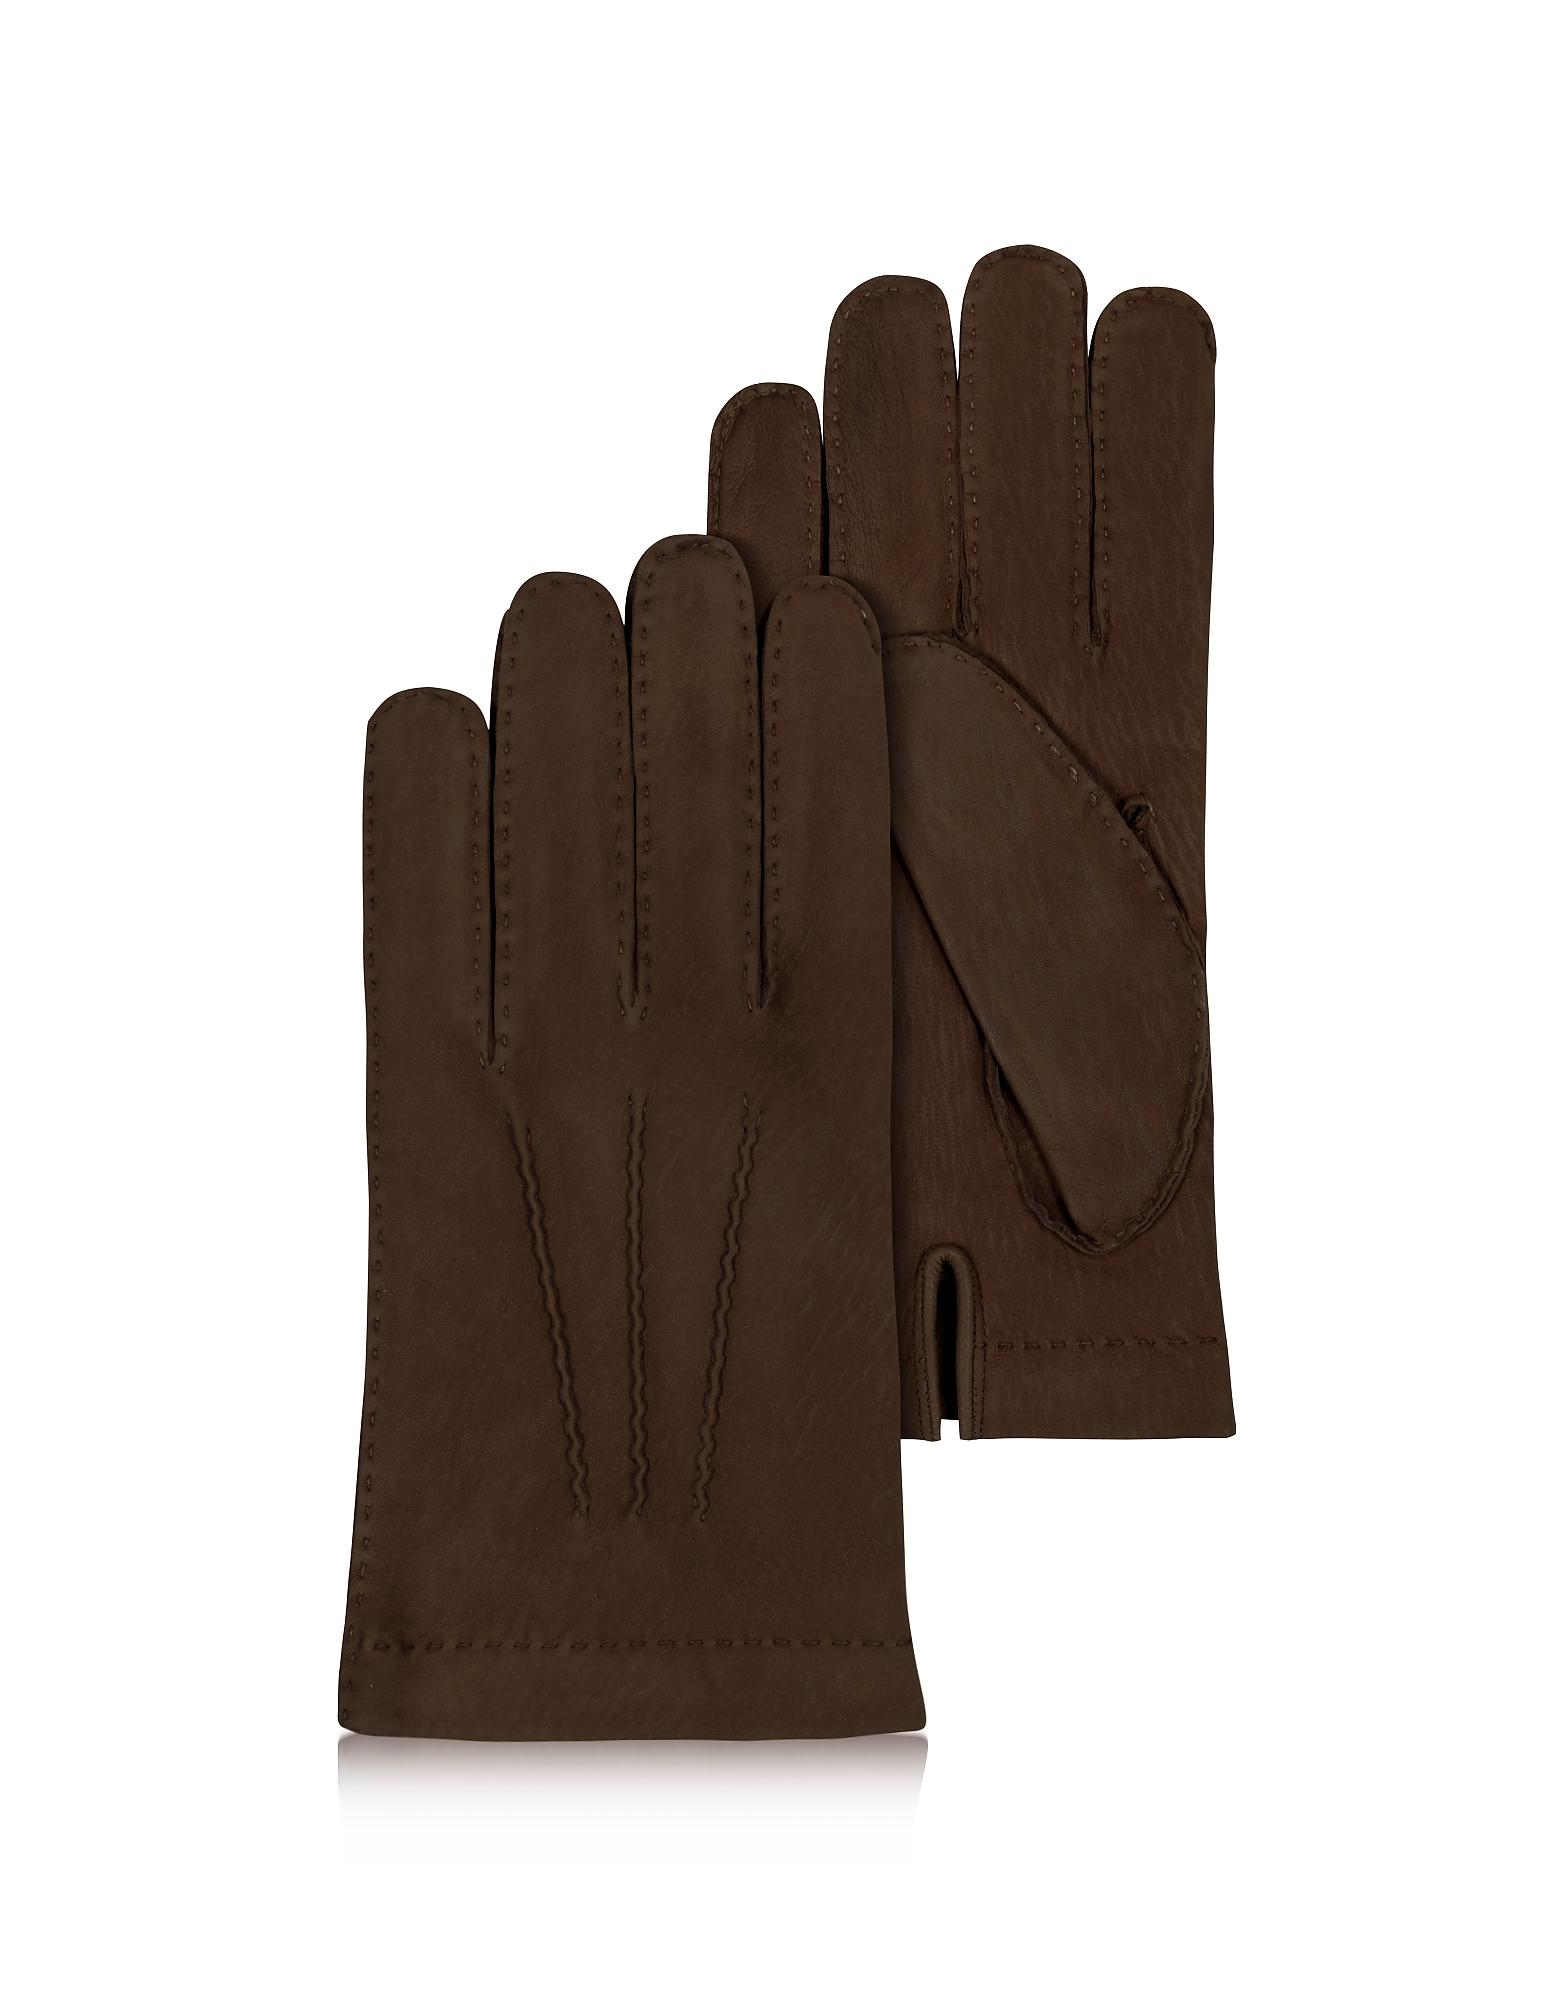 382d6af9906f52 FORZIERI Herren Handschuhe aus Kaschmir und italienischem Kalbsleder ...